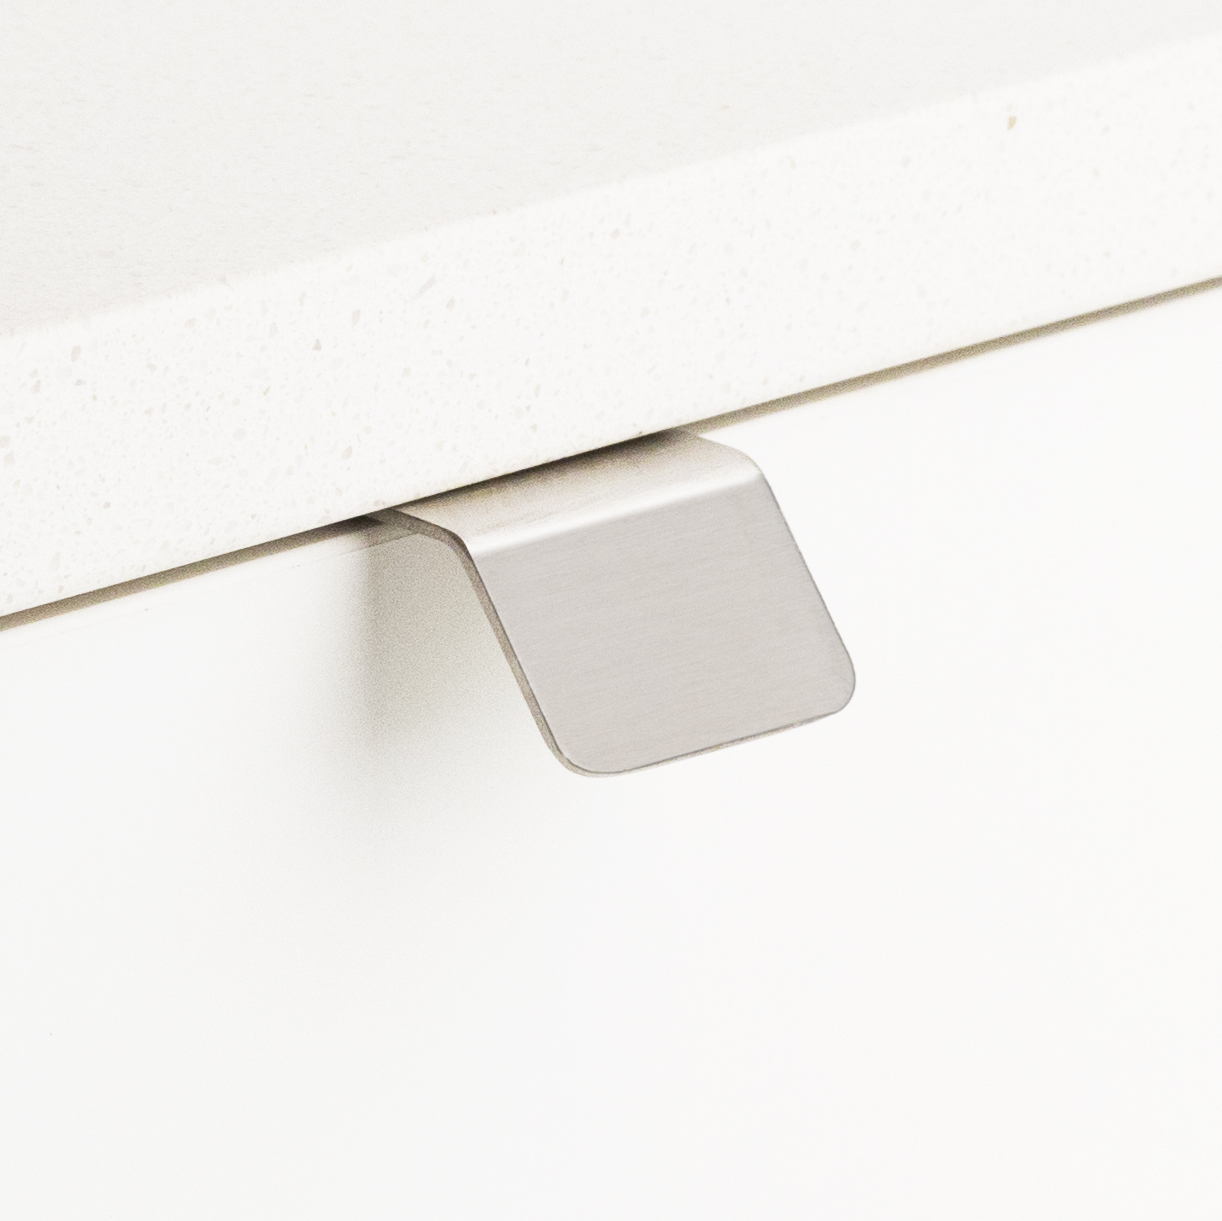 Lip & Straight Edge Pull 32mm Stainless Steel